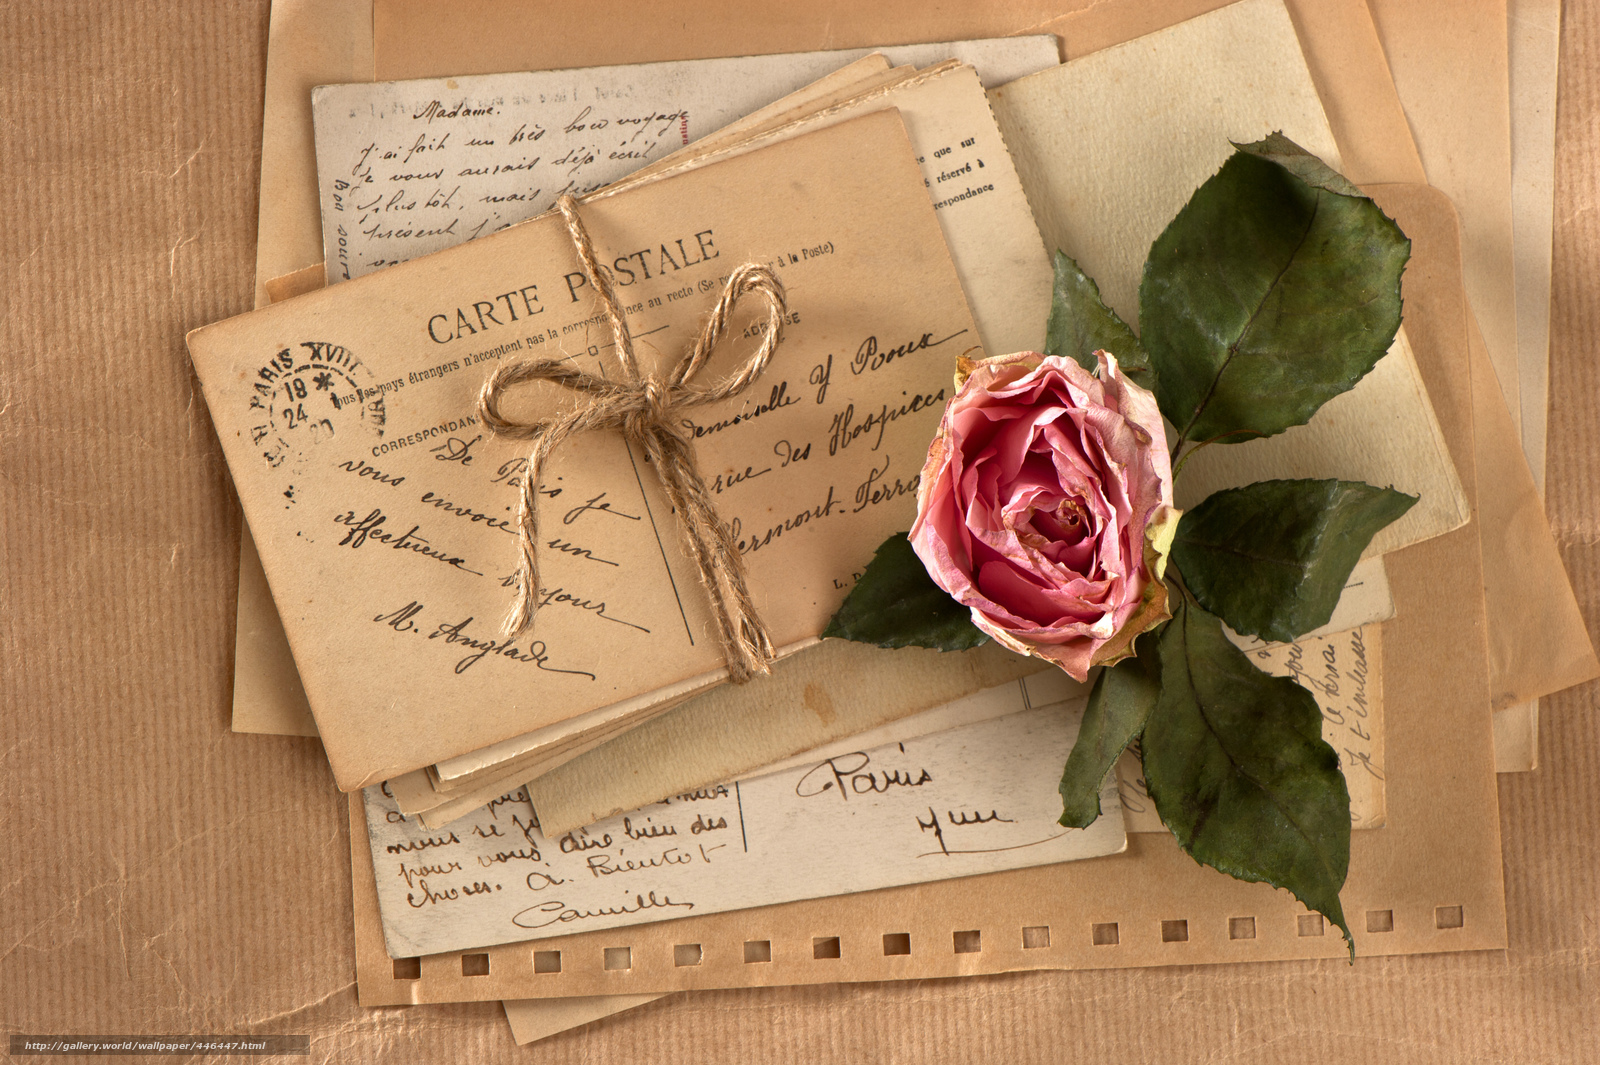 Download Wallpaper Vintage Retro Flower Rose Free